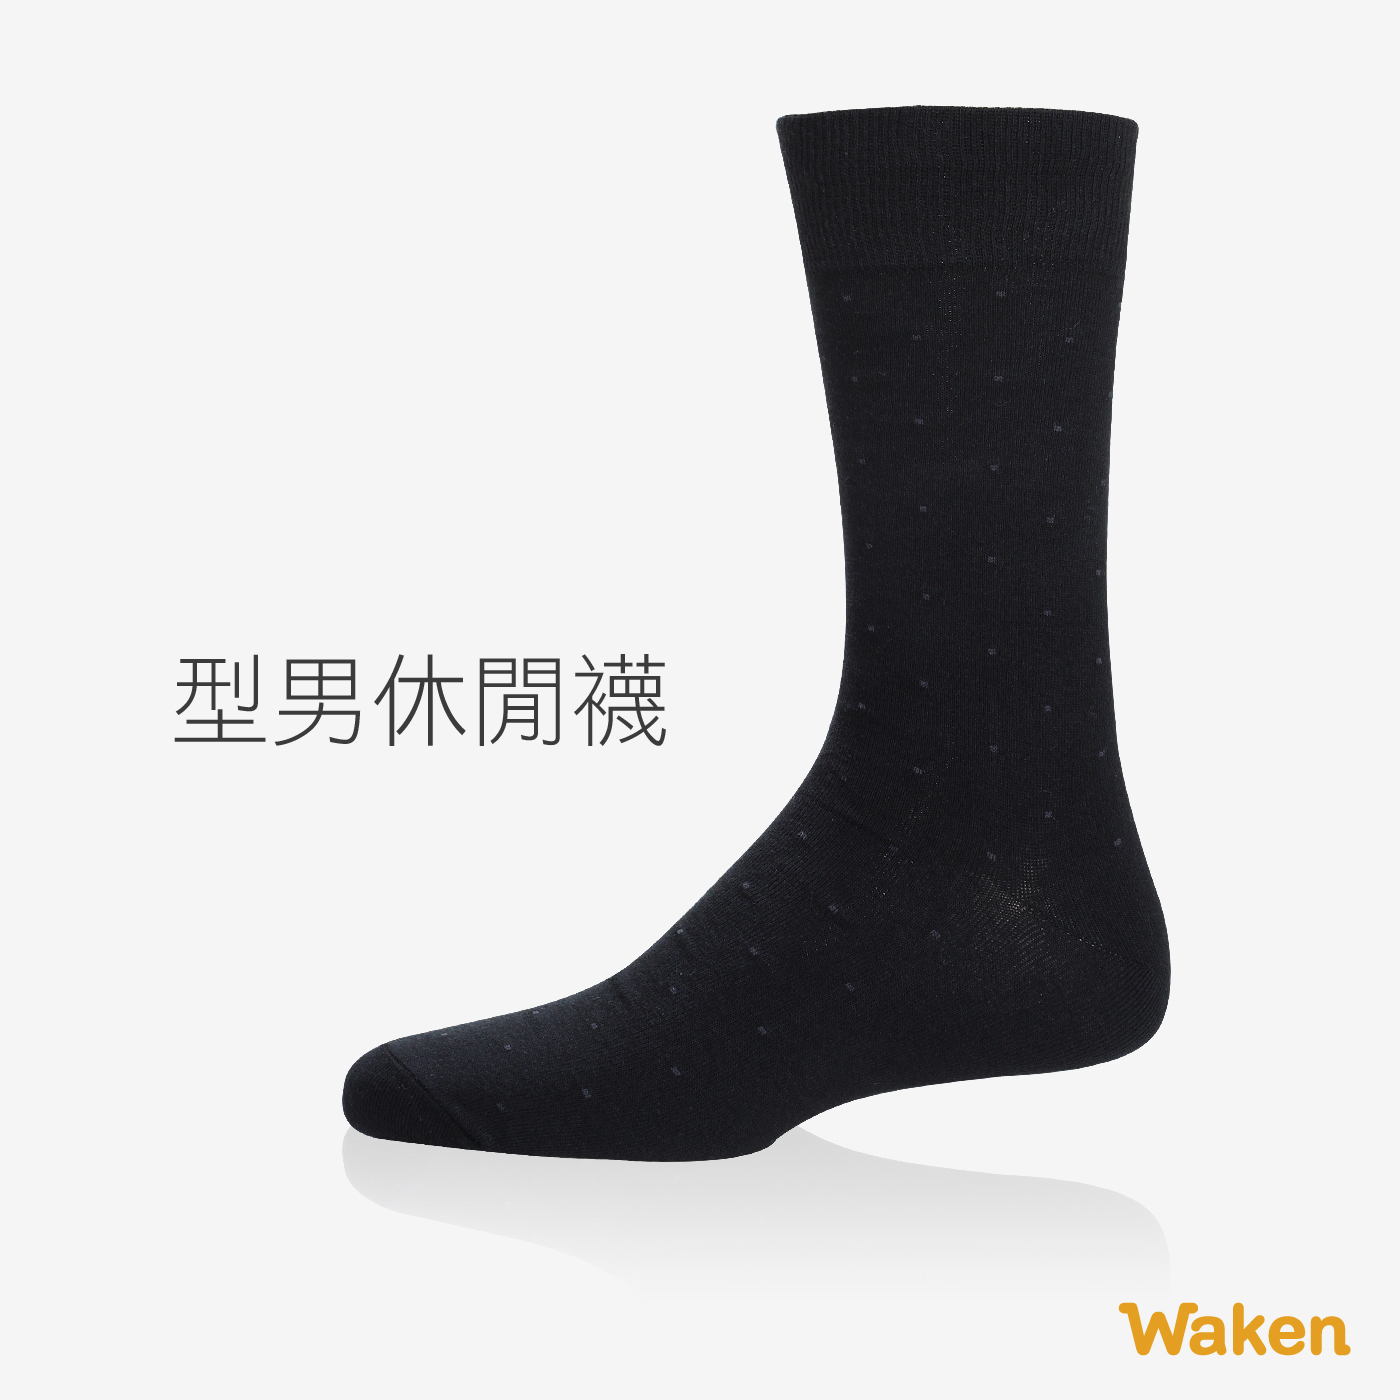 Waken  精梳棉萊卡中筒圓點休閒襪 / 黑 / 男款